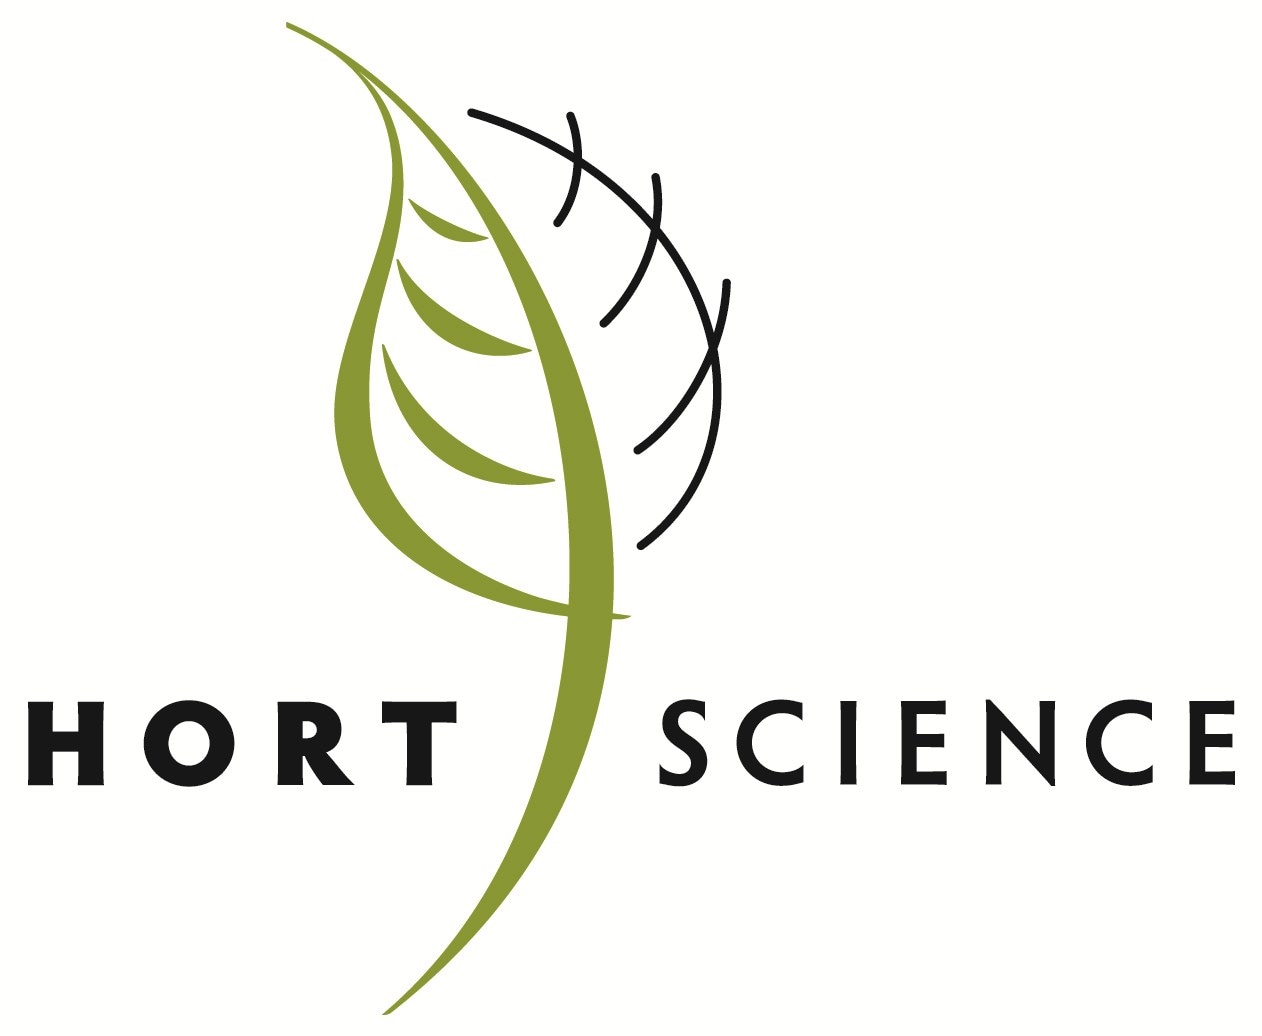 HortScience, Inc.